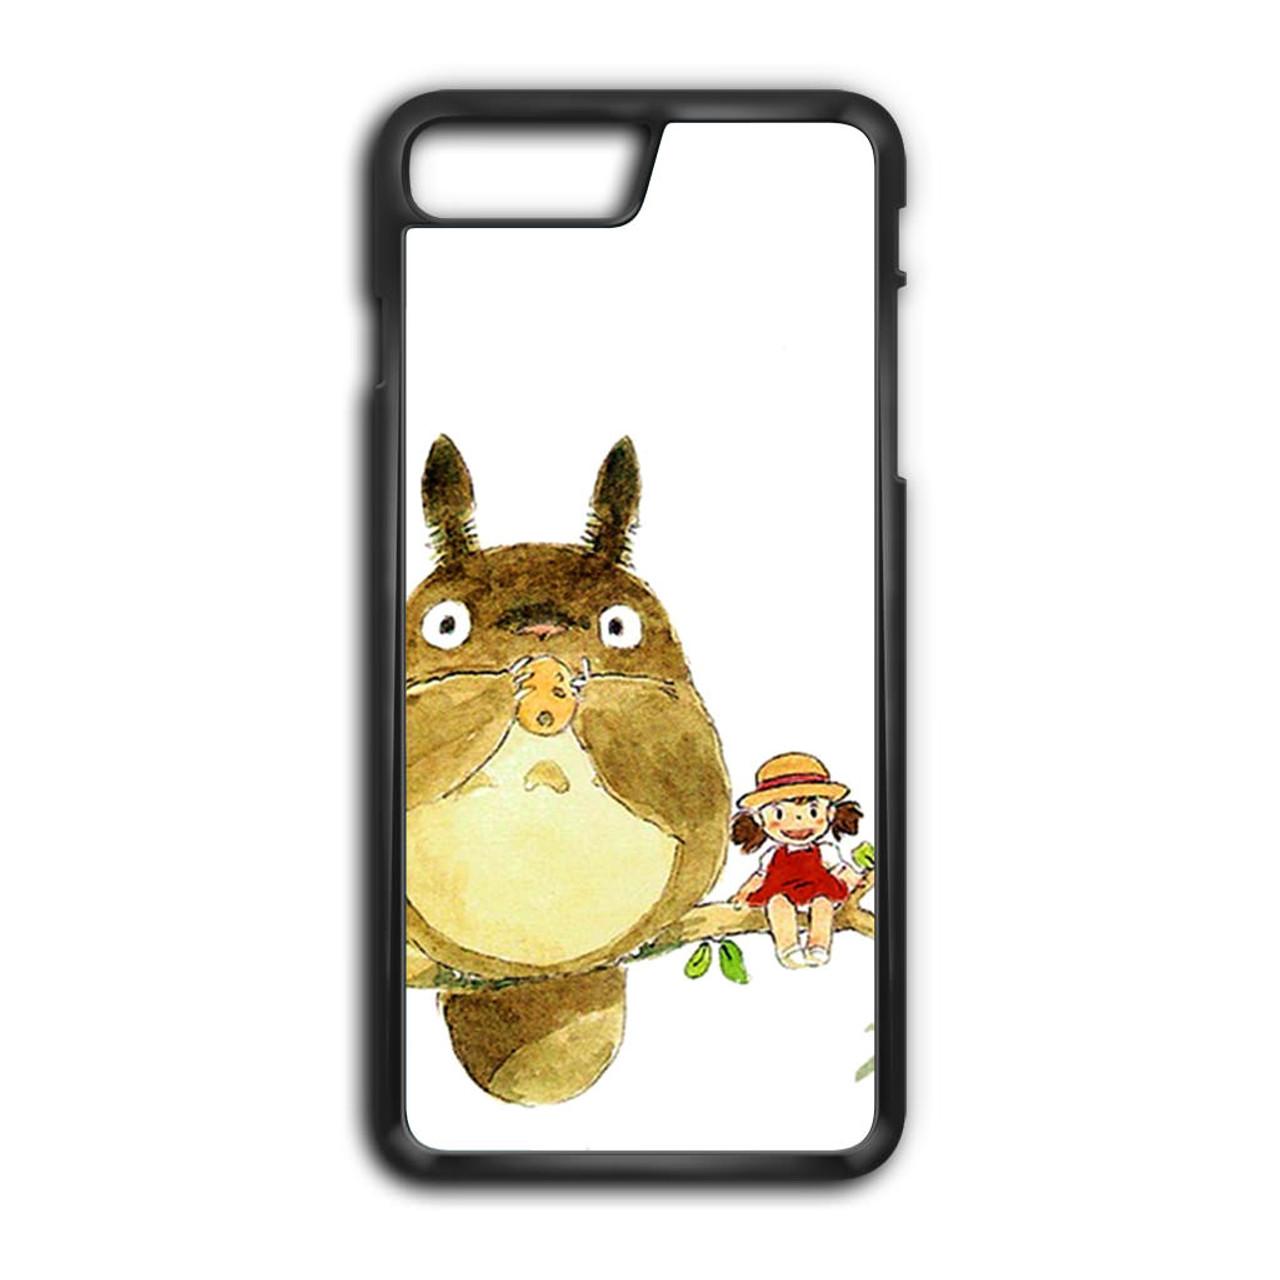 super popular 54947 2fcc4 My Neighbor Totoro Cute Girl Branch Art iPhone 7 Plus Case